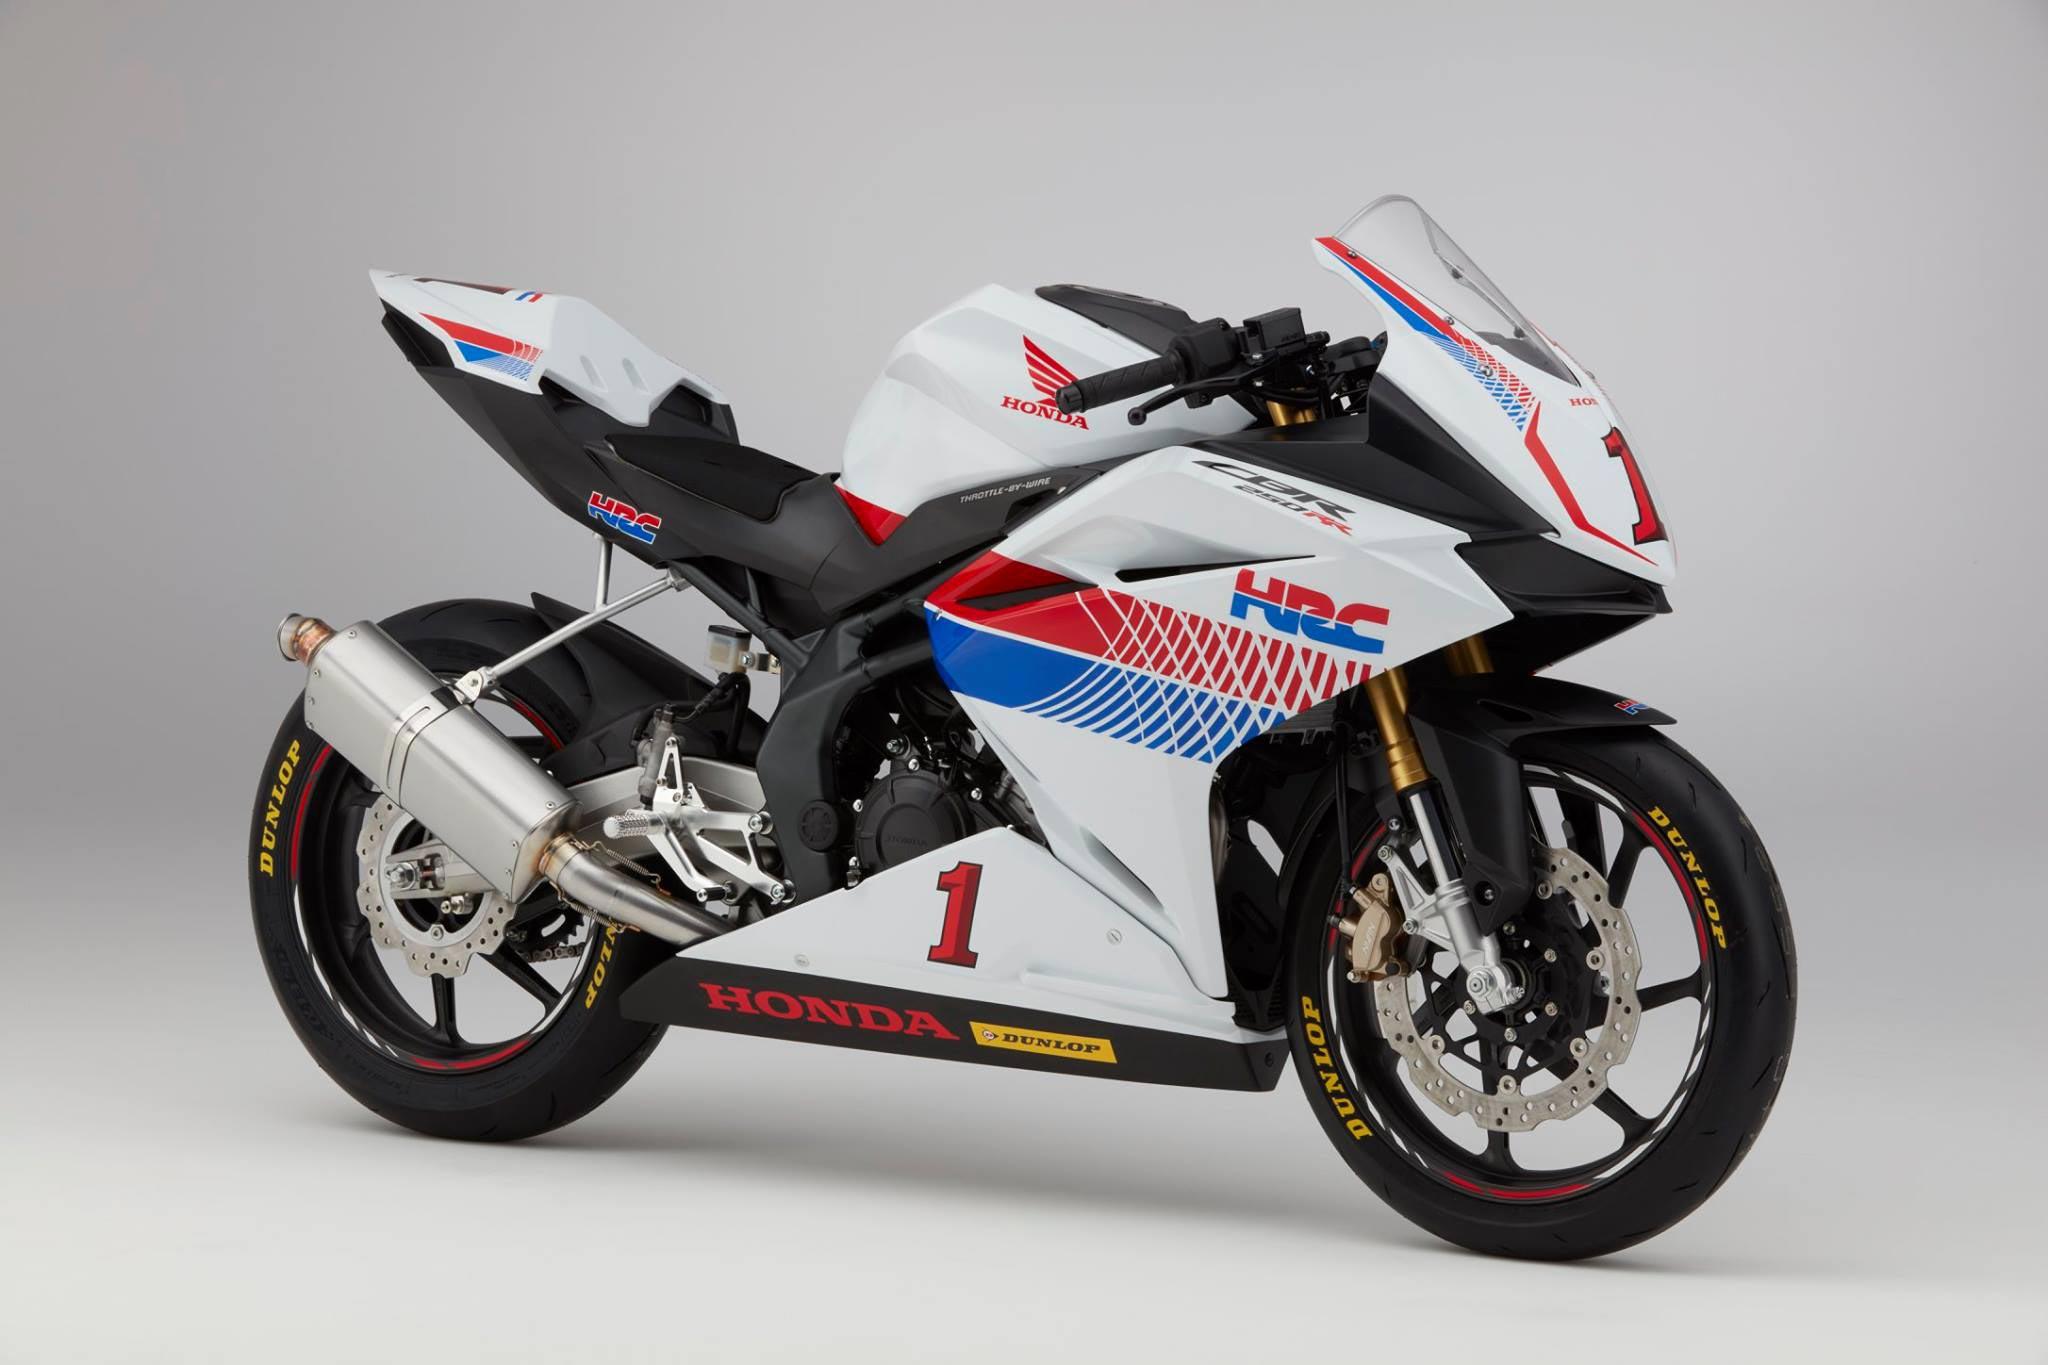 Honda CBR250RR, Reporting for Racing Duty - Asphalt & Rubber